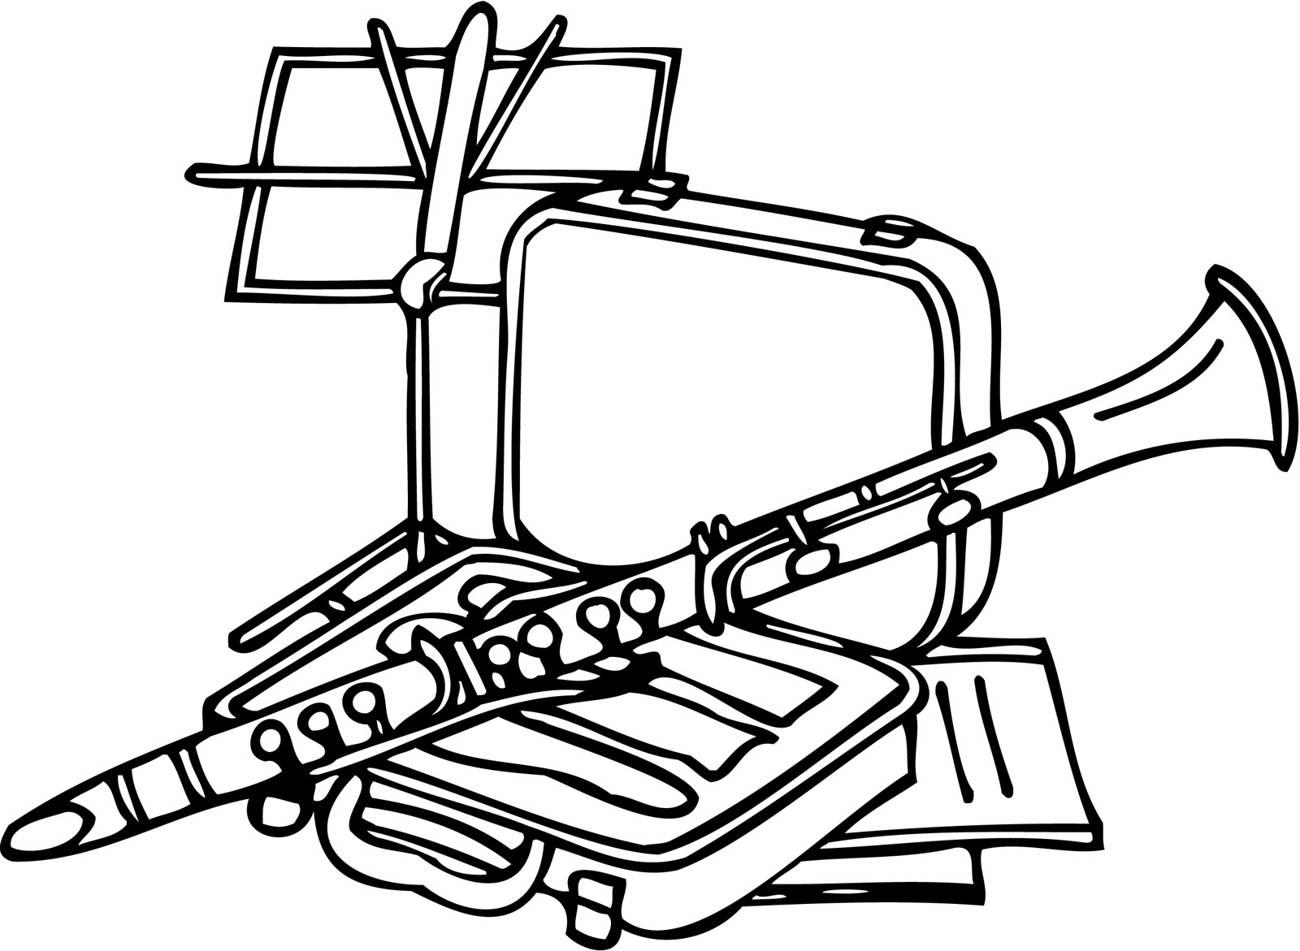 MUSIC-066